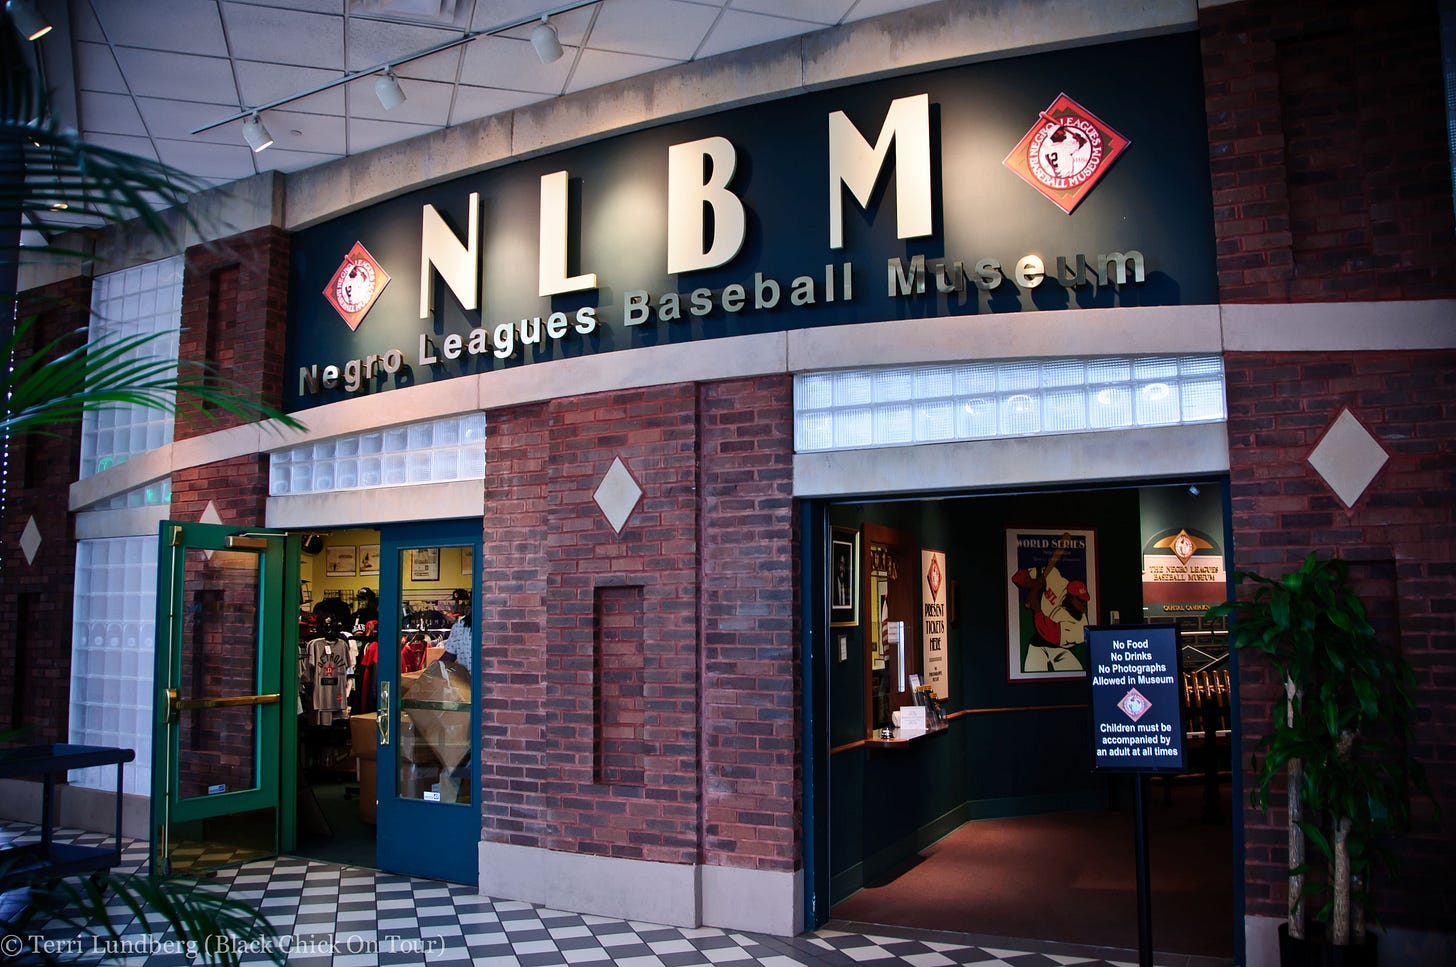 Negro-Leagues-Baseball-Museum-Signage.jpg